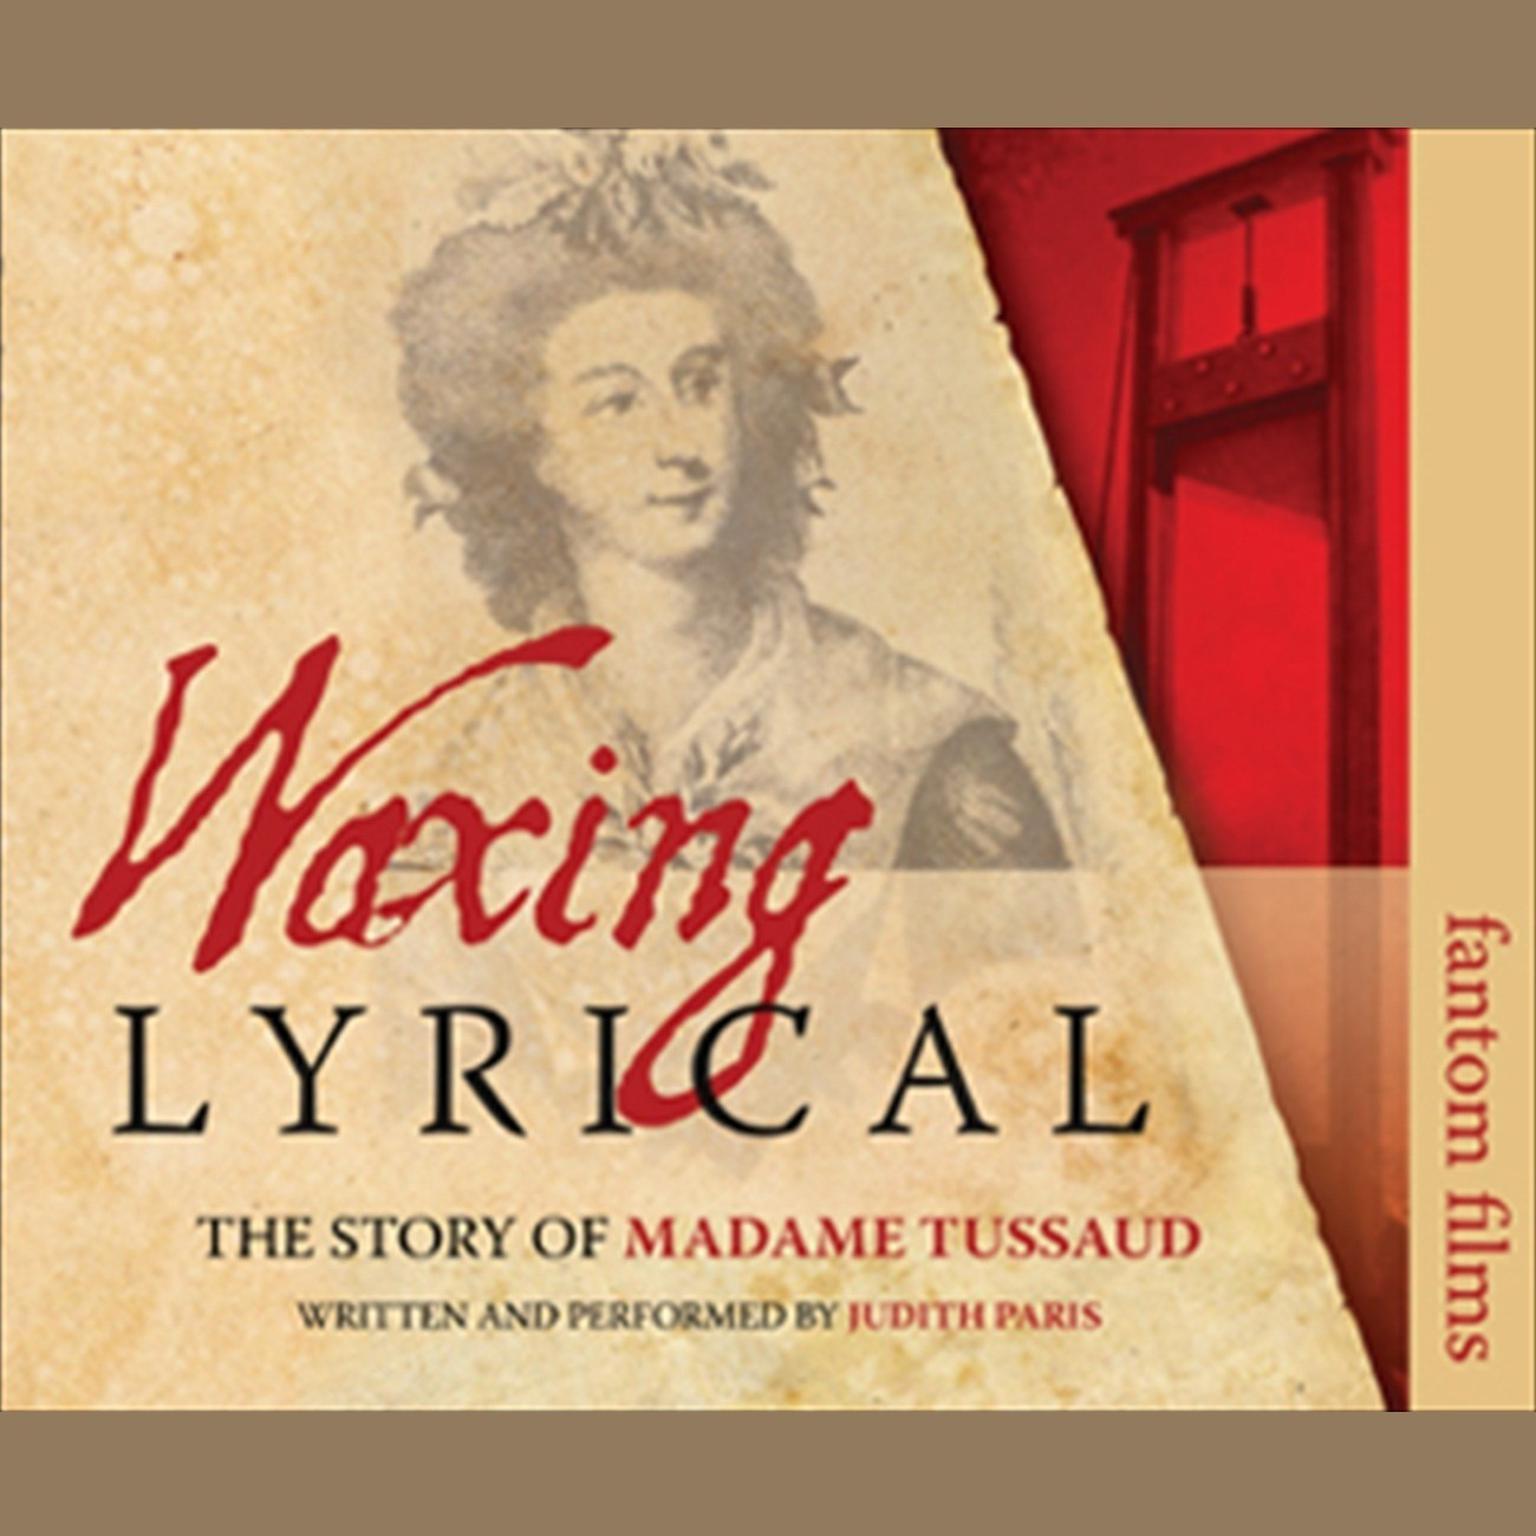 Printable Waxing Lyrical Audiobook Cover Art